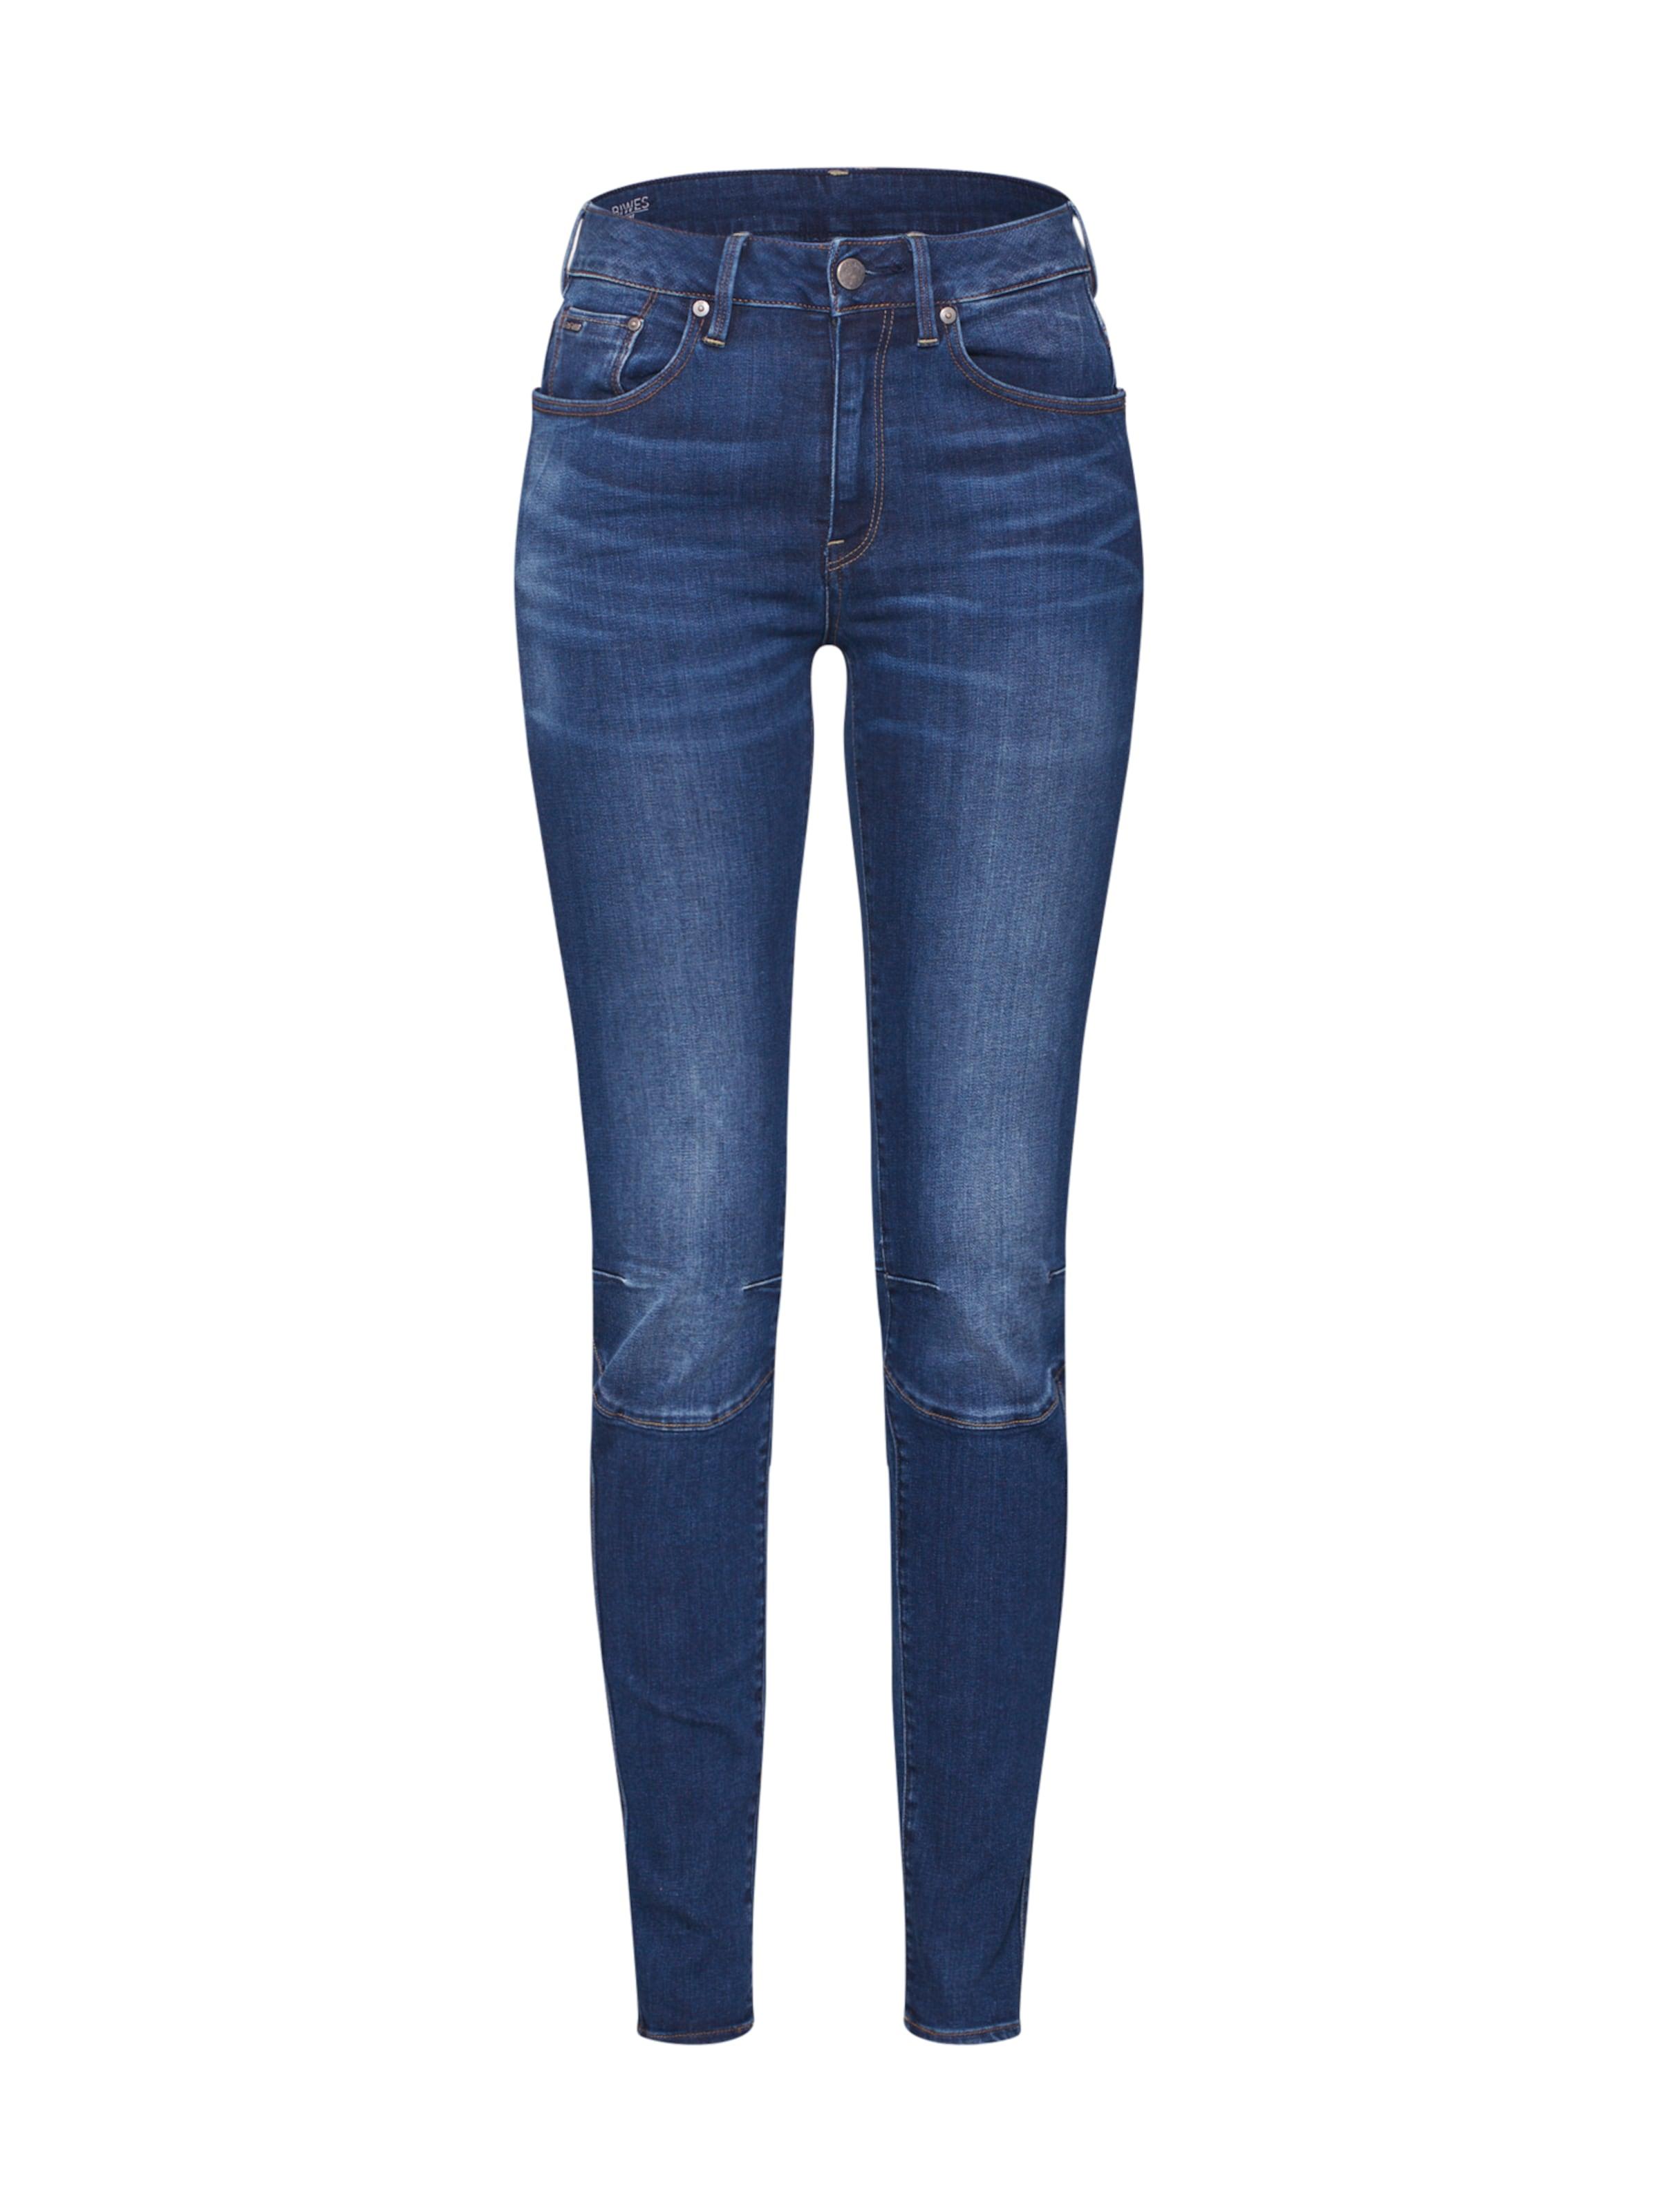 Raw 'biwes' Blue G star Jeans In Denim qMVjLzpGSU